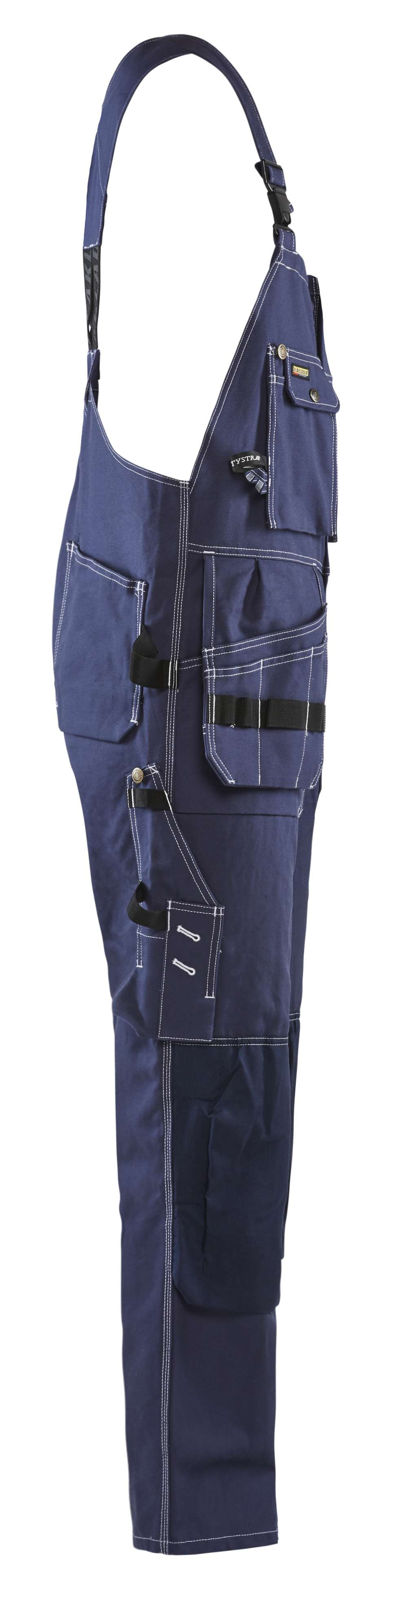 Blaklader Am. Overalls 26001370 marineblauw(8800)